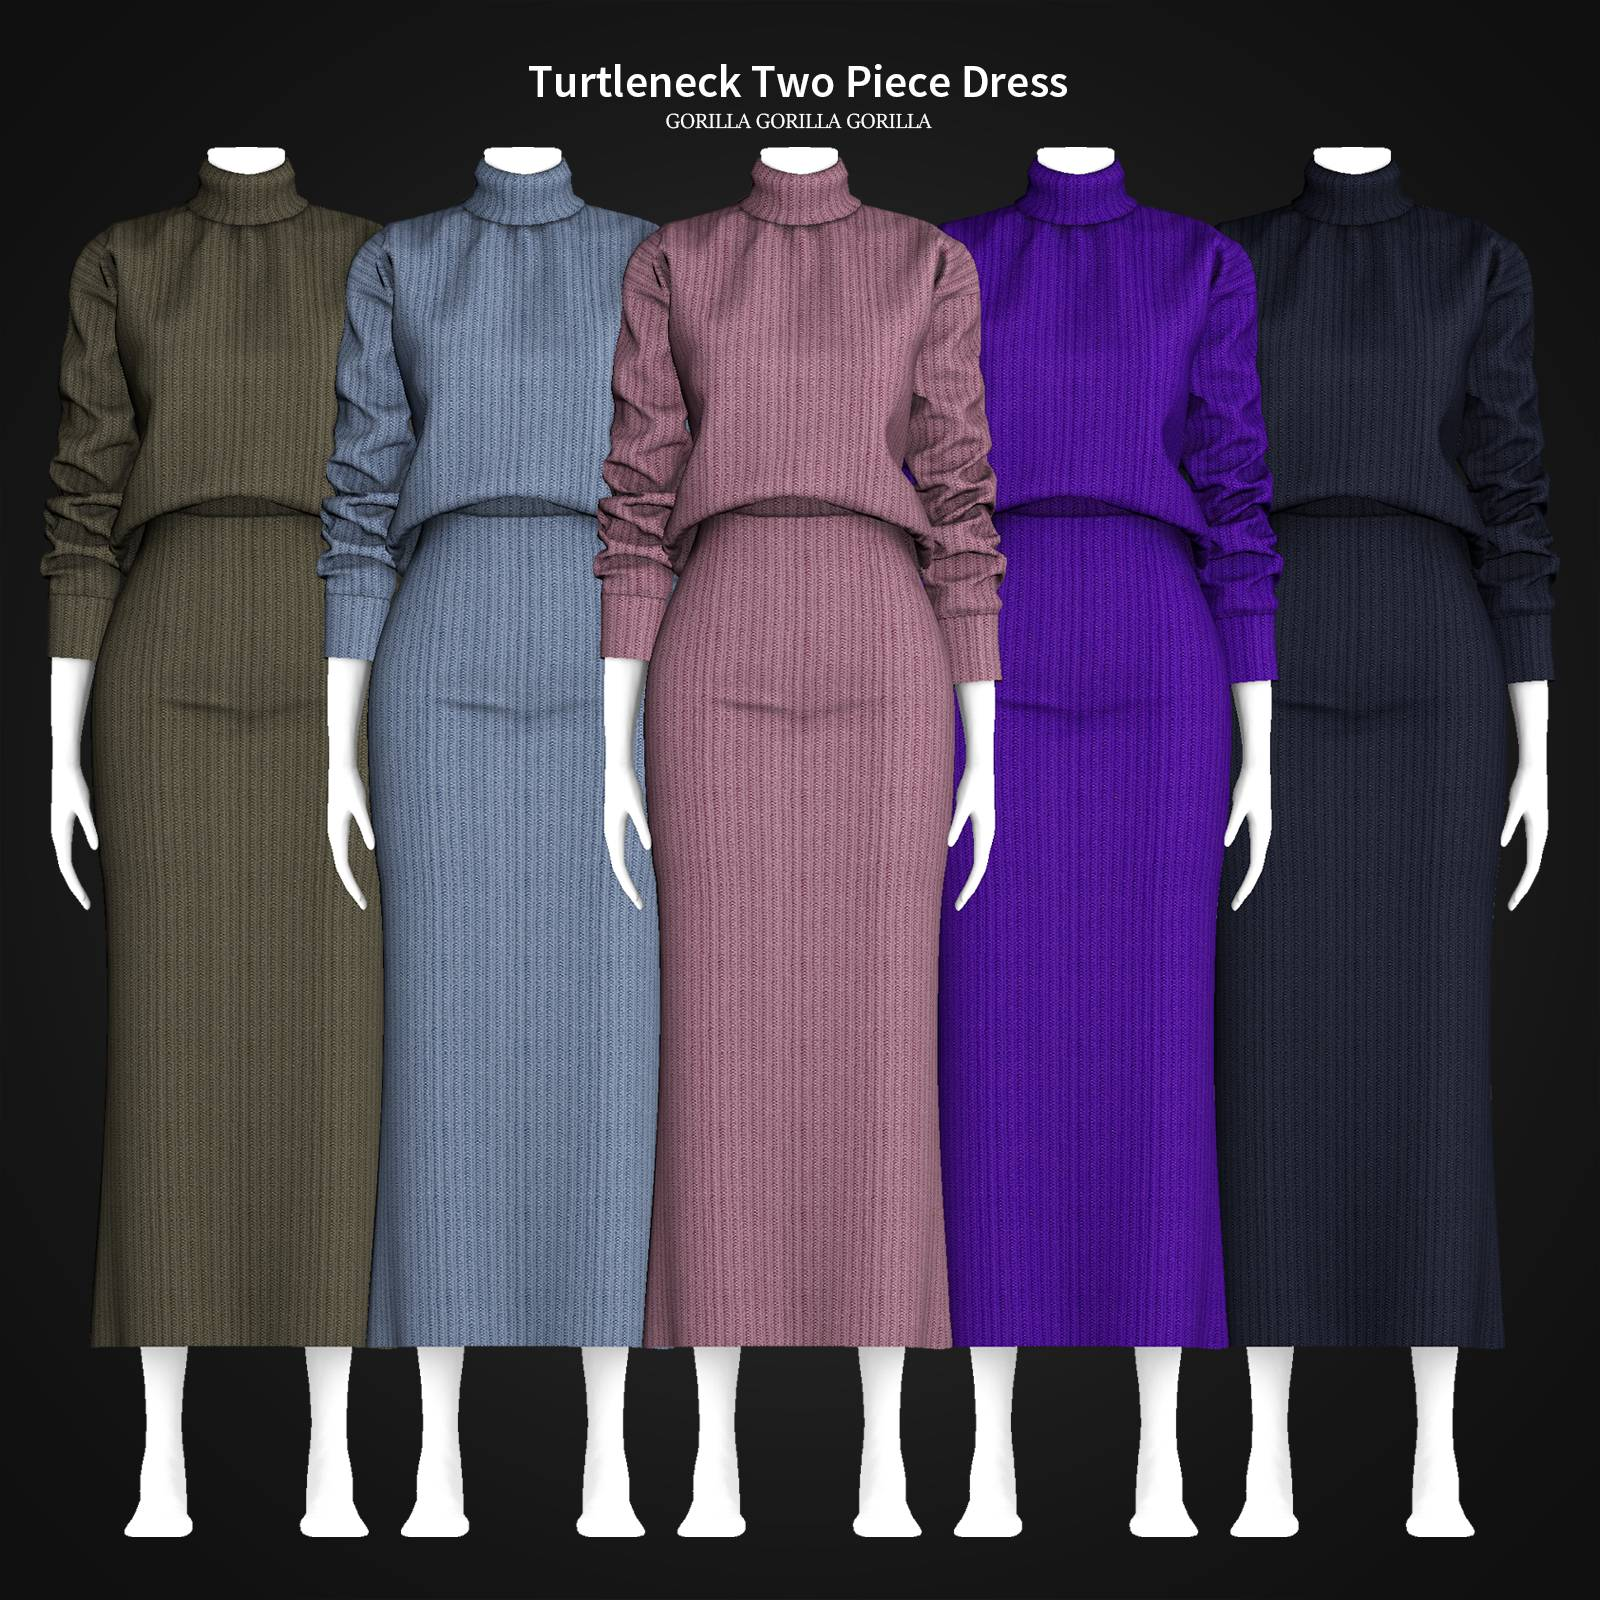 Кофта и юбка - Turtleneck Two Piece Dress